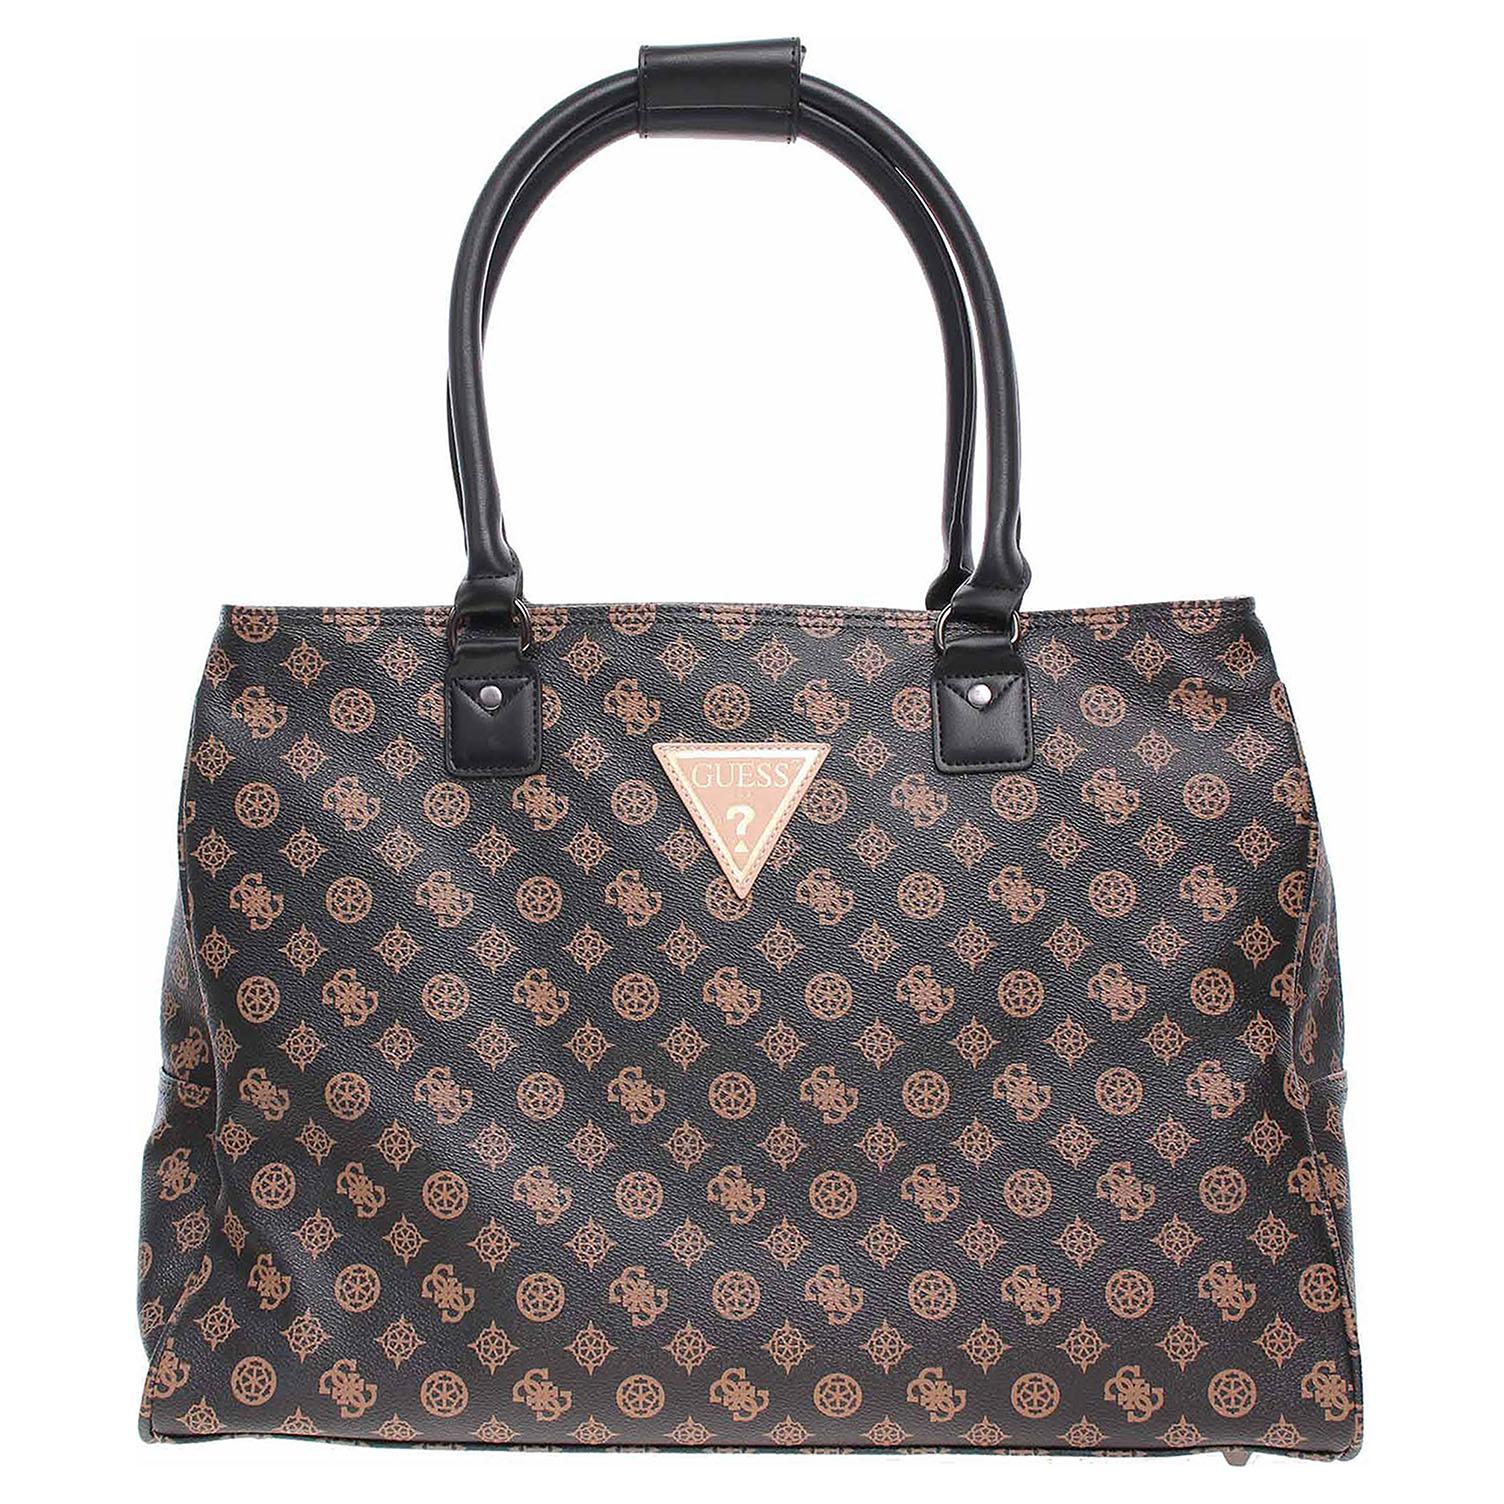 Ecco Guess dámská taška Wilder Travel brown 10701238